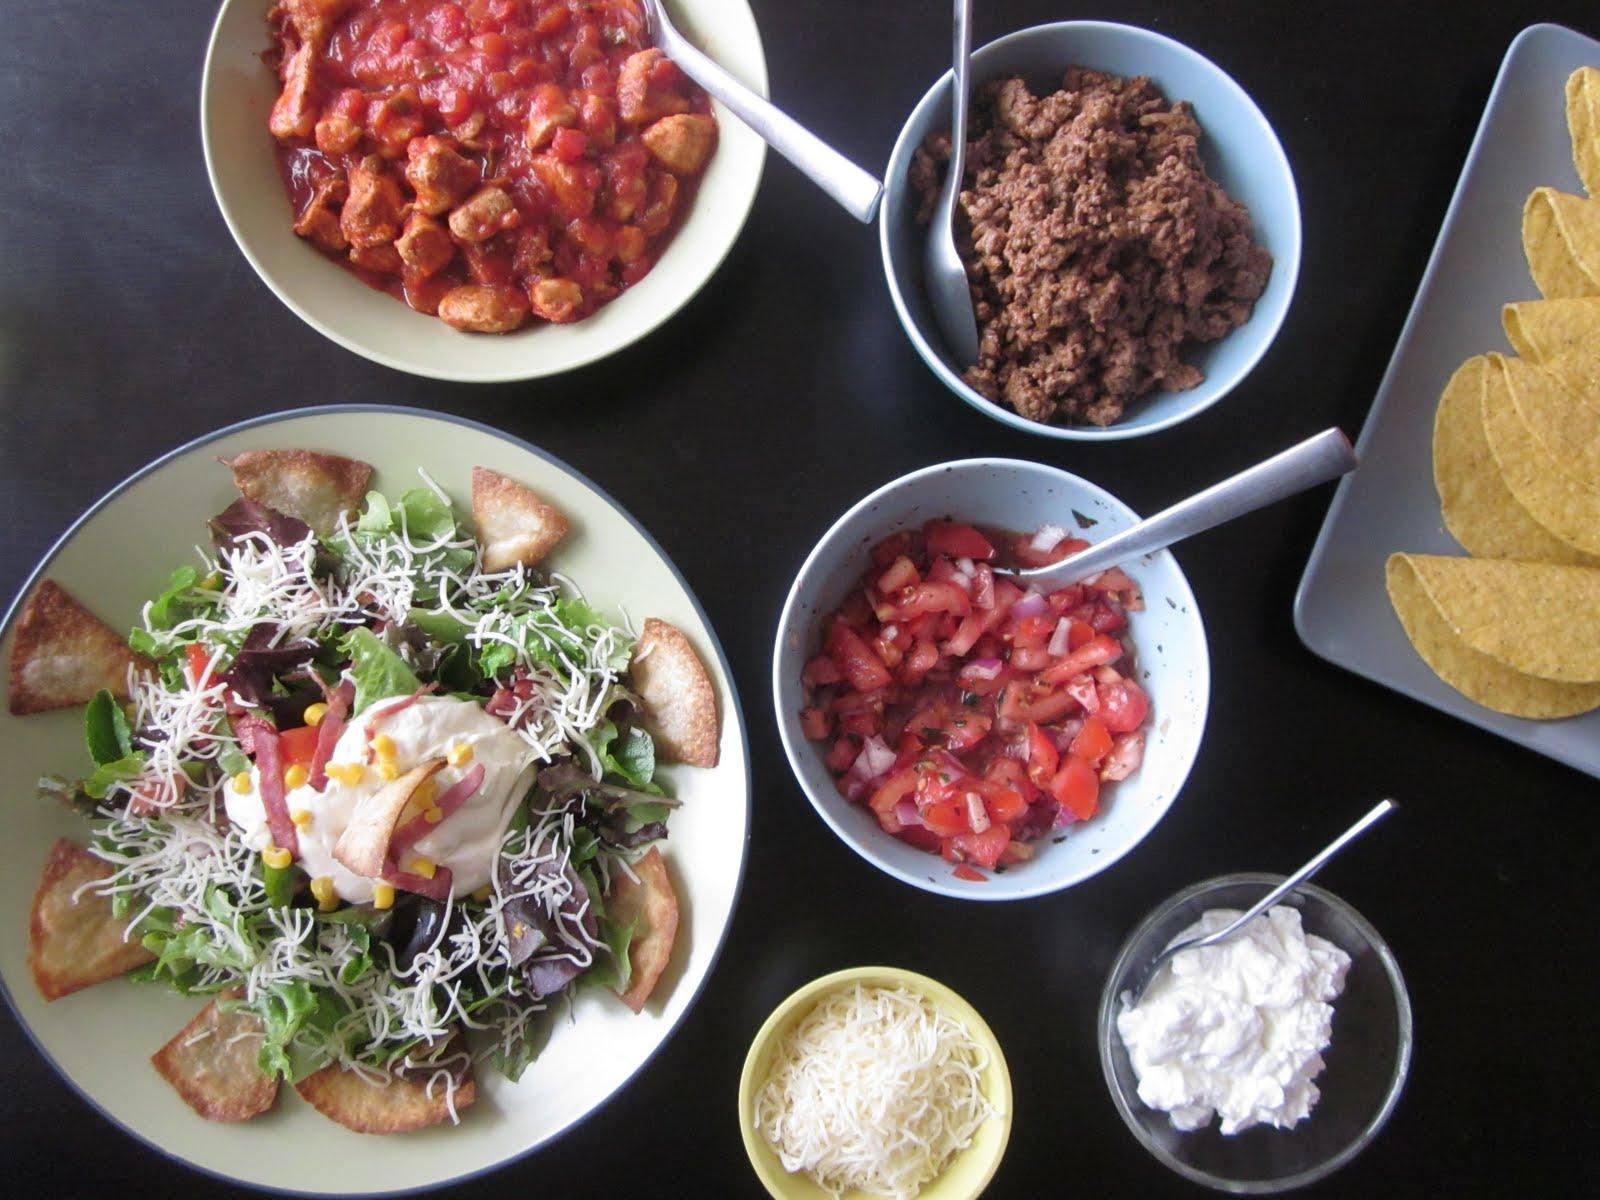 Pj S Mexican Kitchen Northcote Northcote Vic